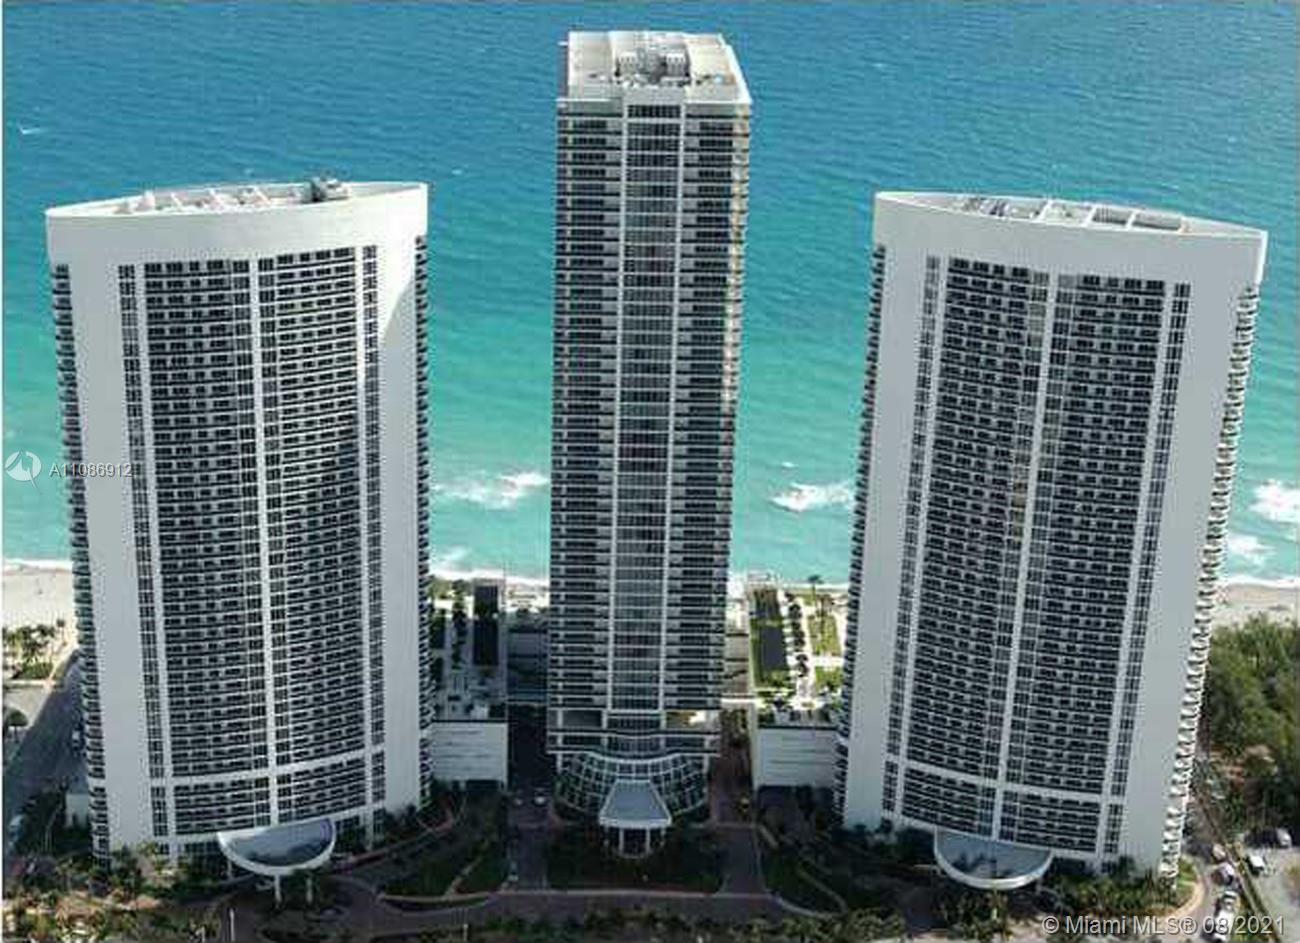 Resort style 5 Star prestigious complex with 9 pools, full scale Spa, Olympic Gym, restaurant, beach